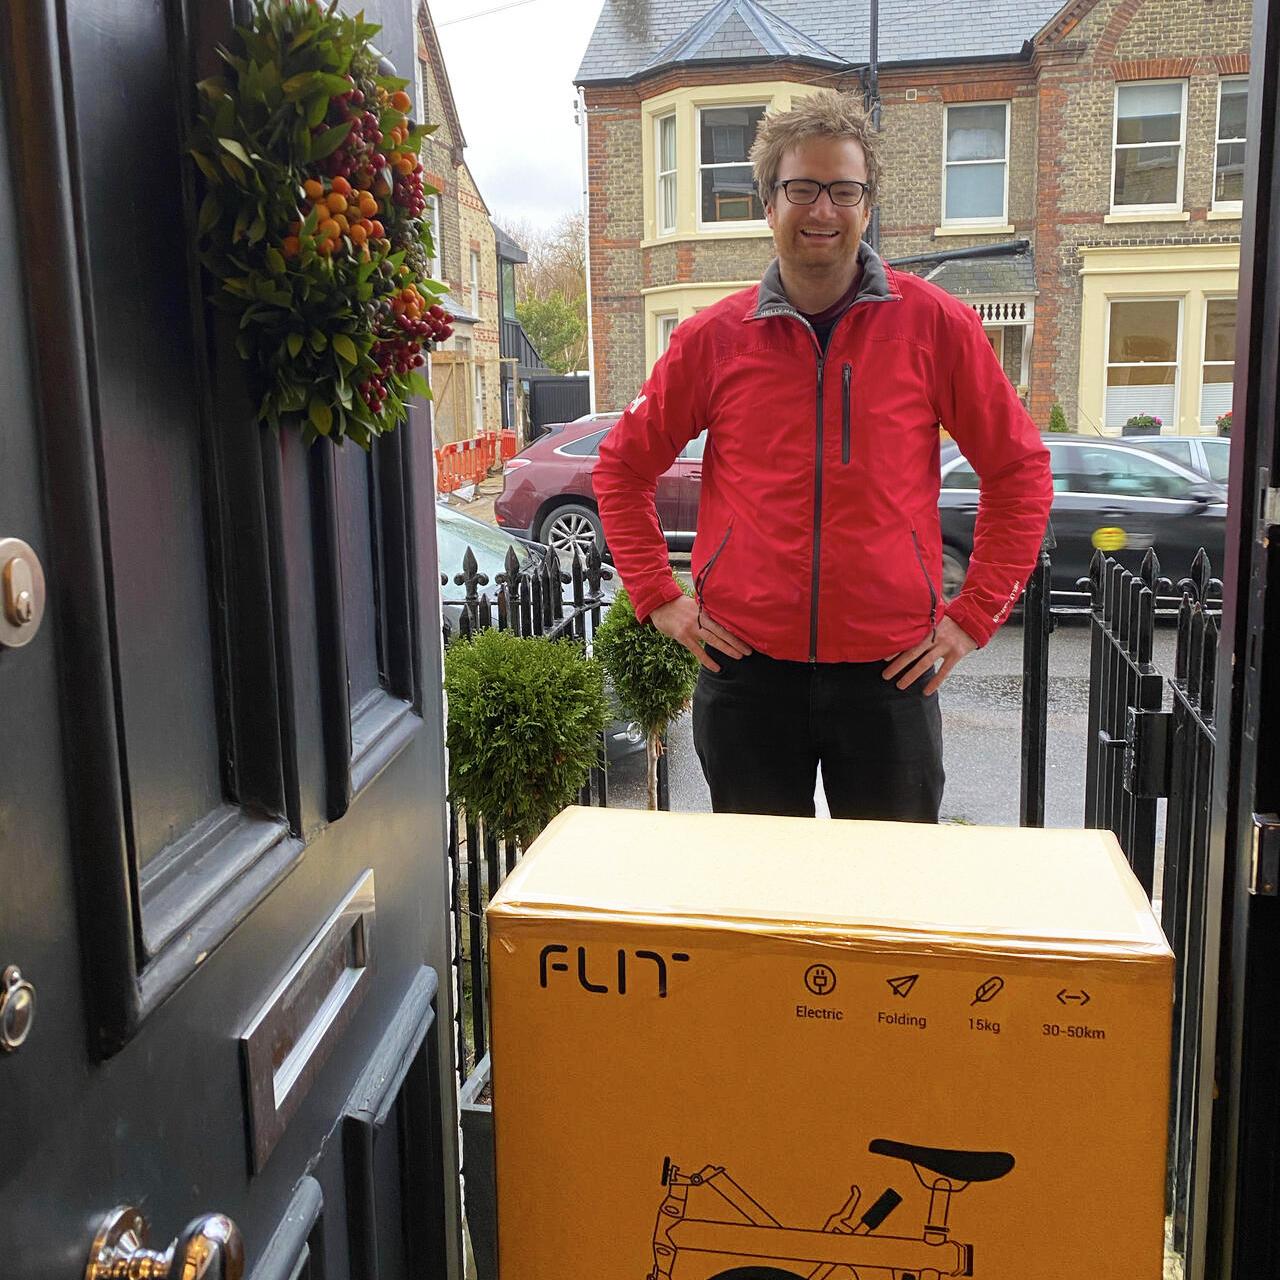 Alex delivering bikes in Cambridge